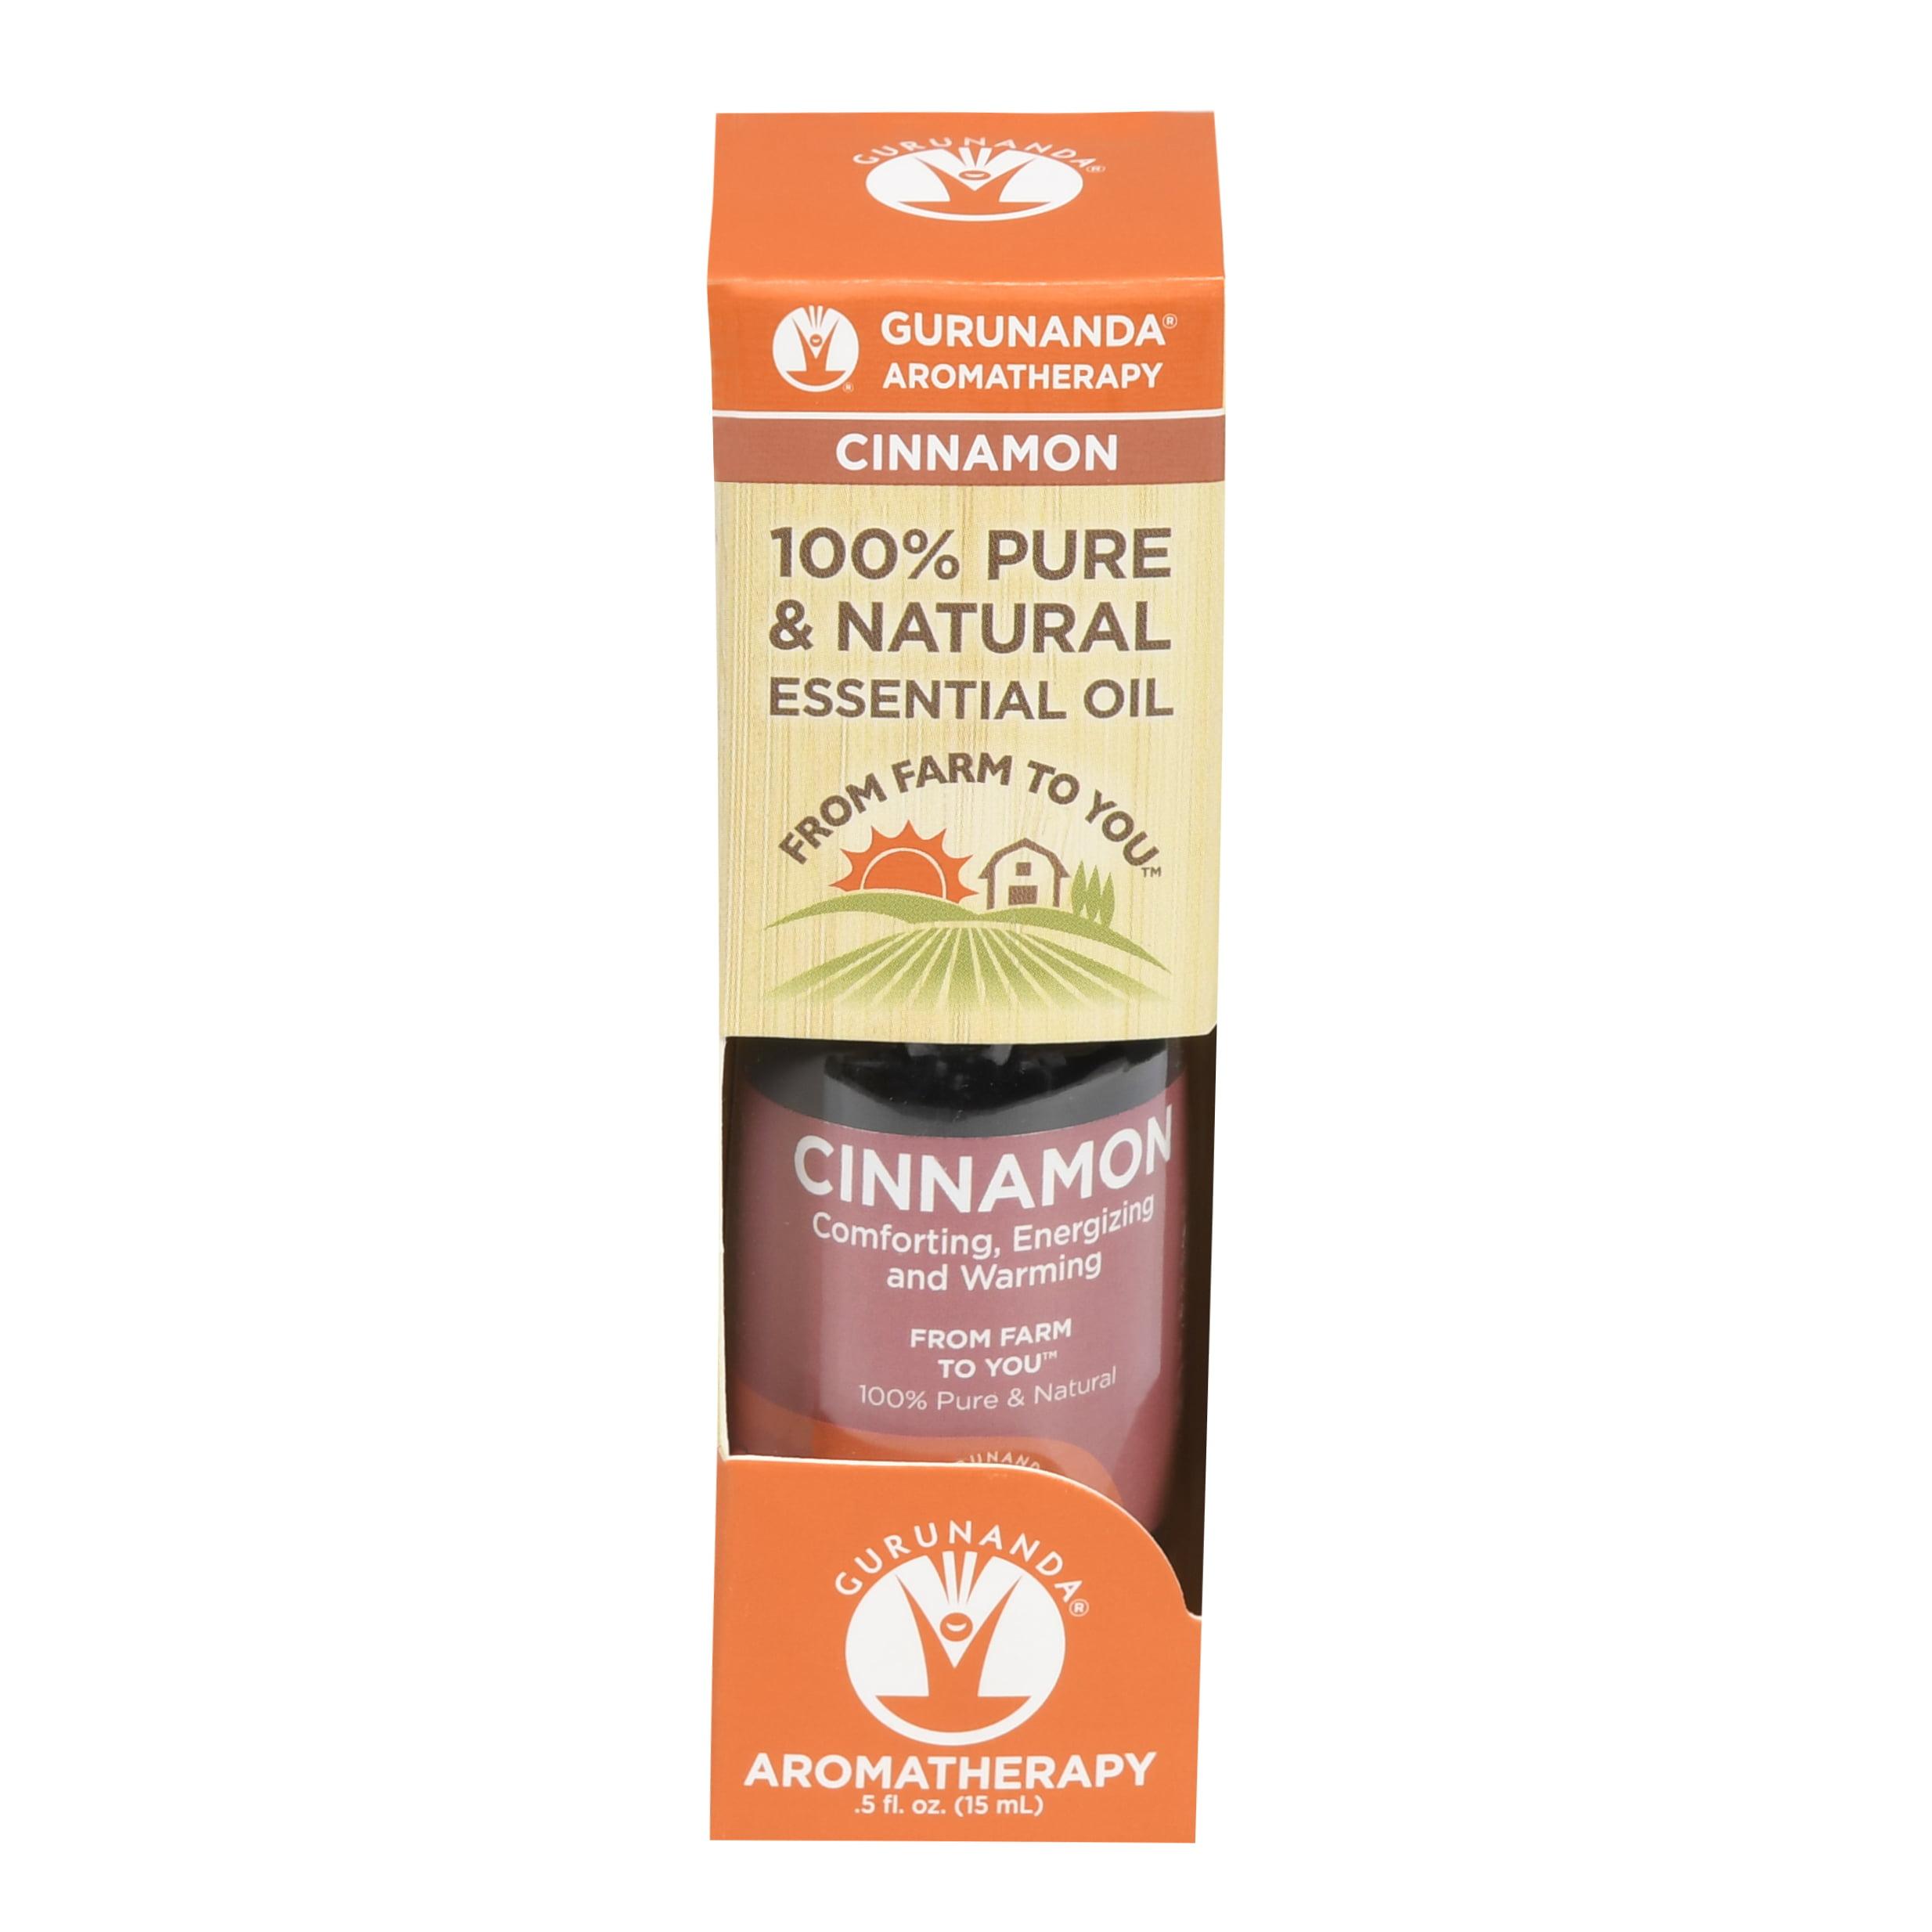 GuruNanda Aromatherapy 100% Pure & Natural , Cinnamon, .5 fl oz